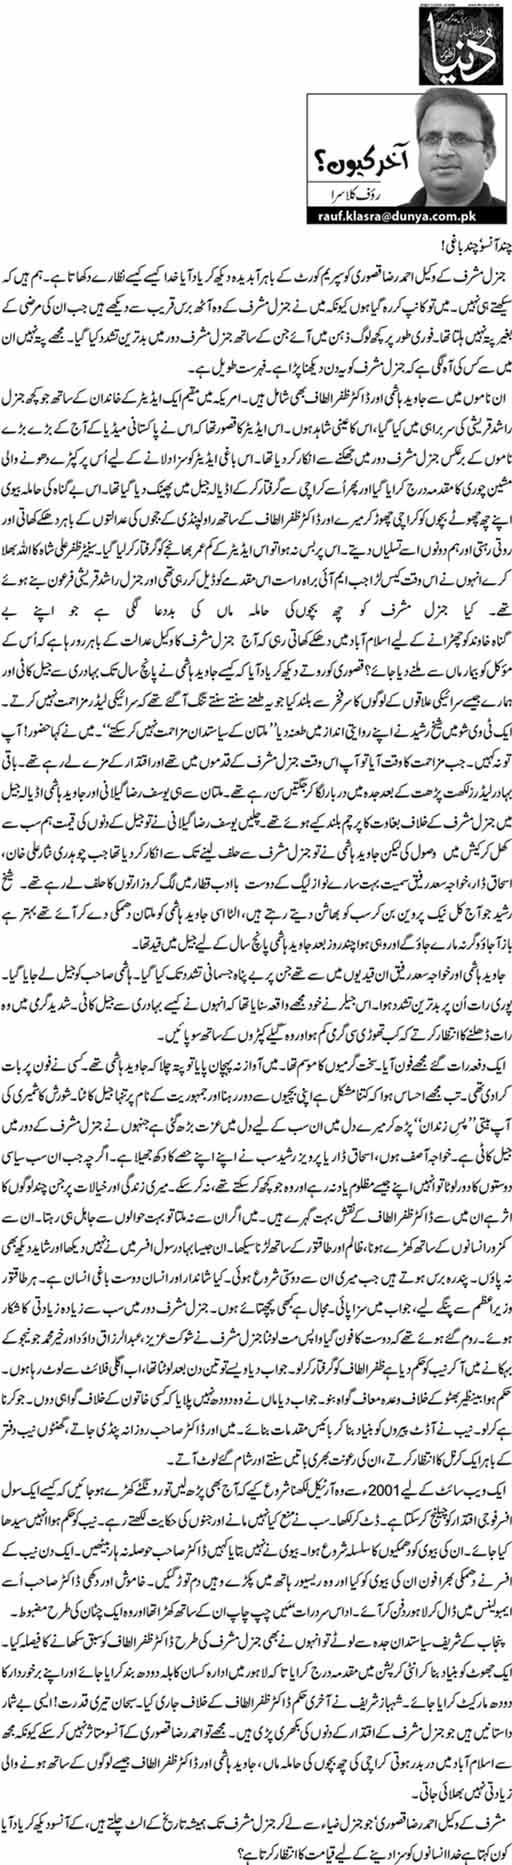 Chand Aanso'Chand Baghi! - Rauf Klasra